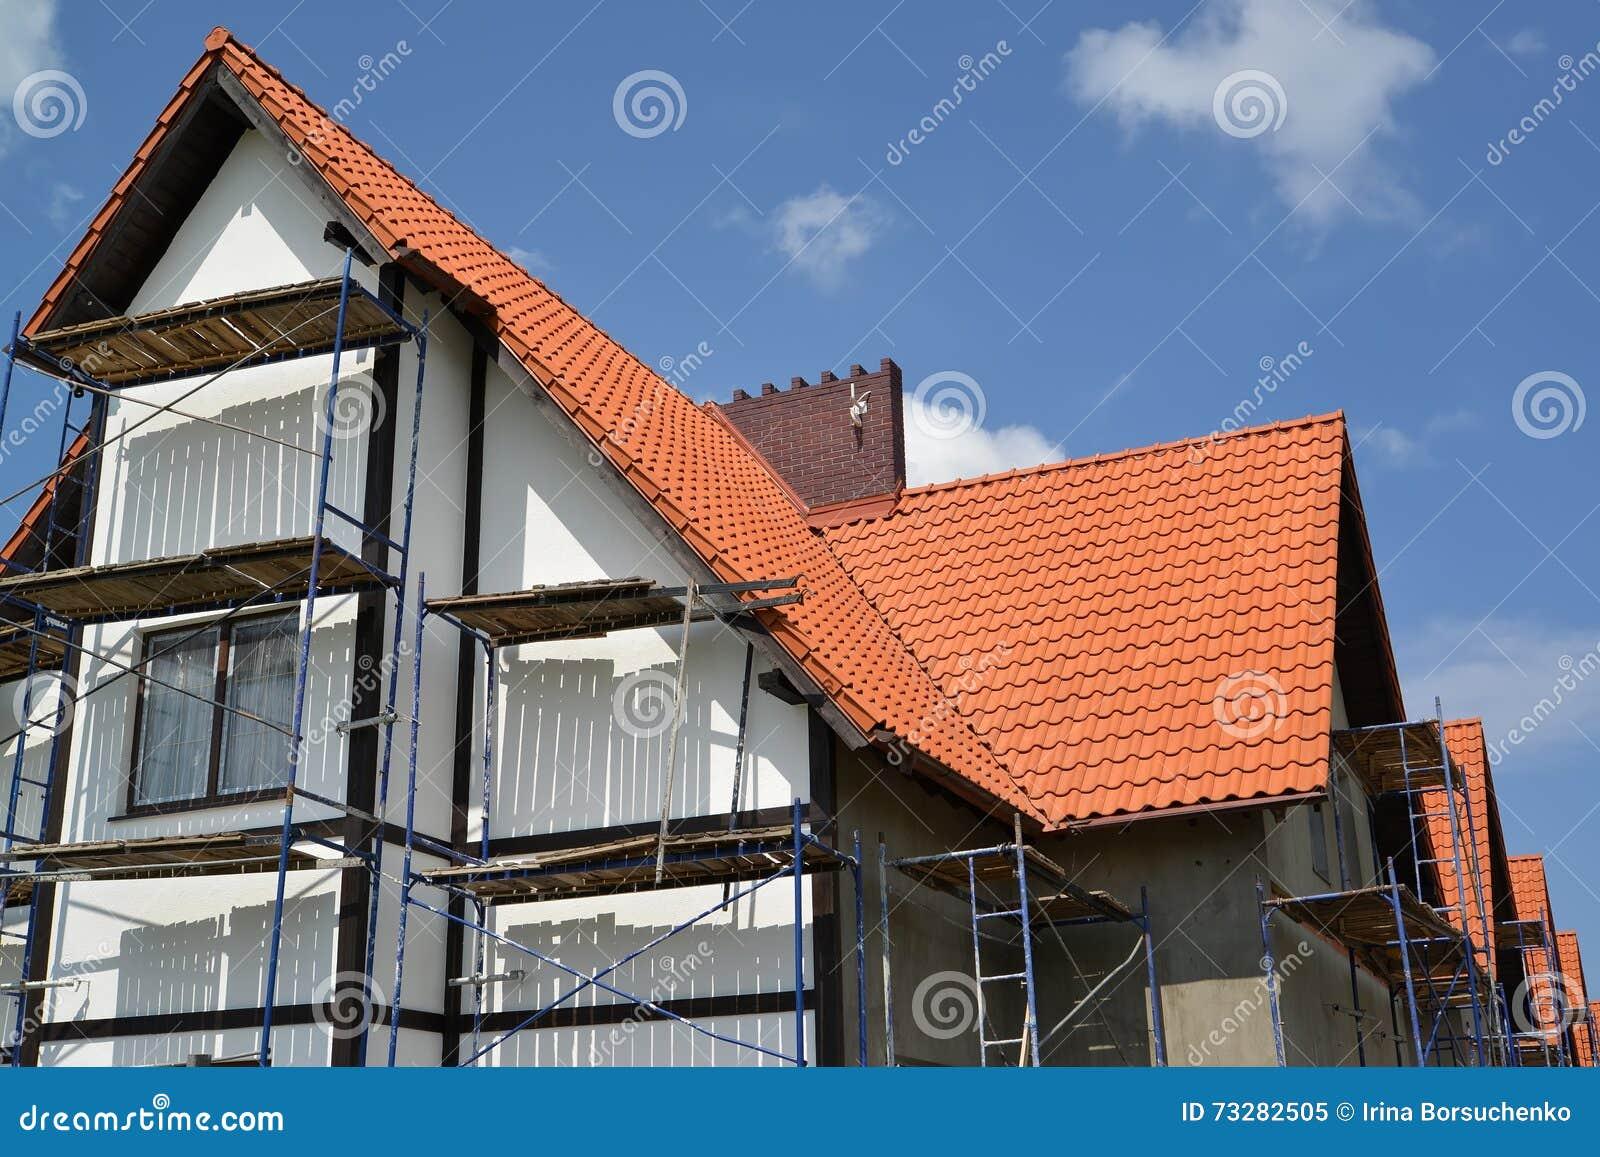 facade maison avec tuile rouge. Black Bedroom Furniture Sets. Home Design Ideas